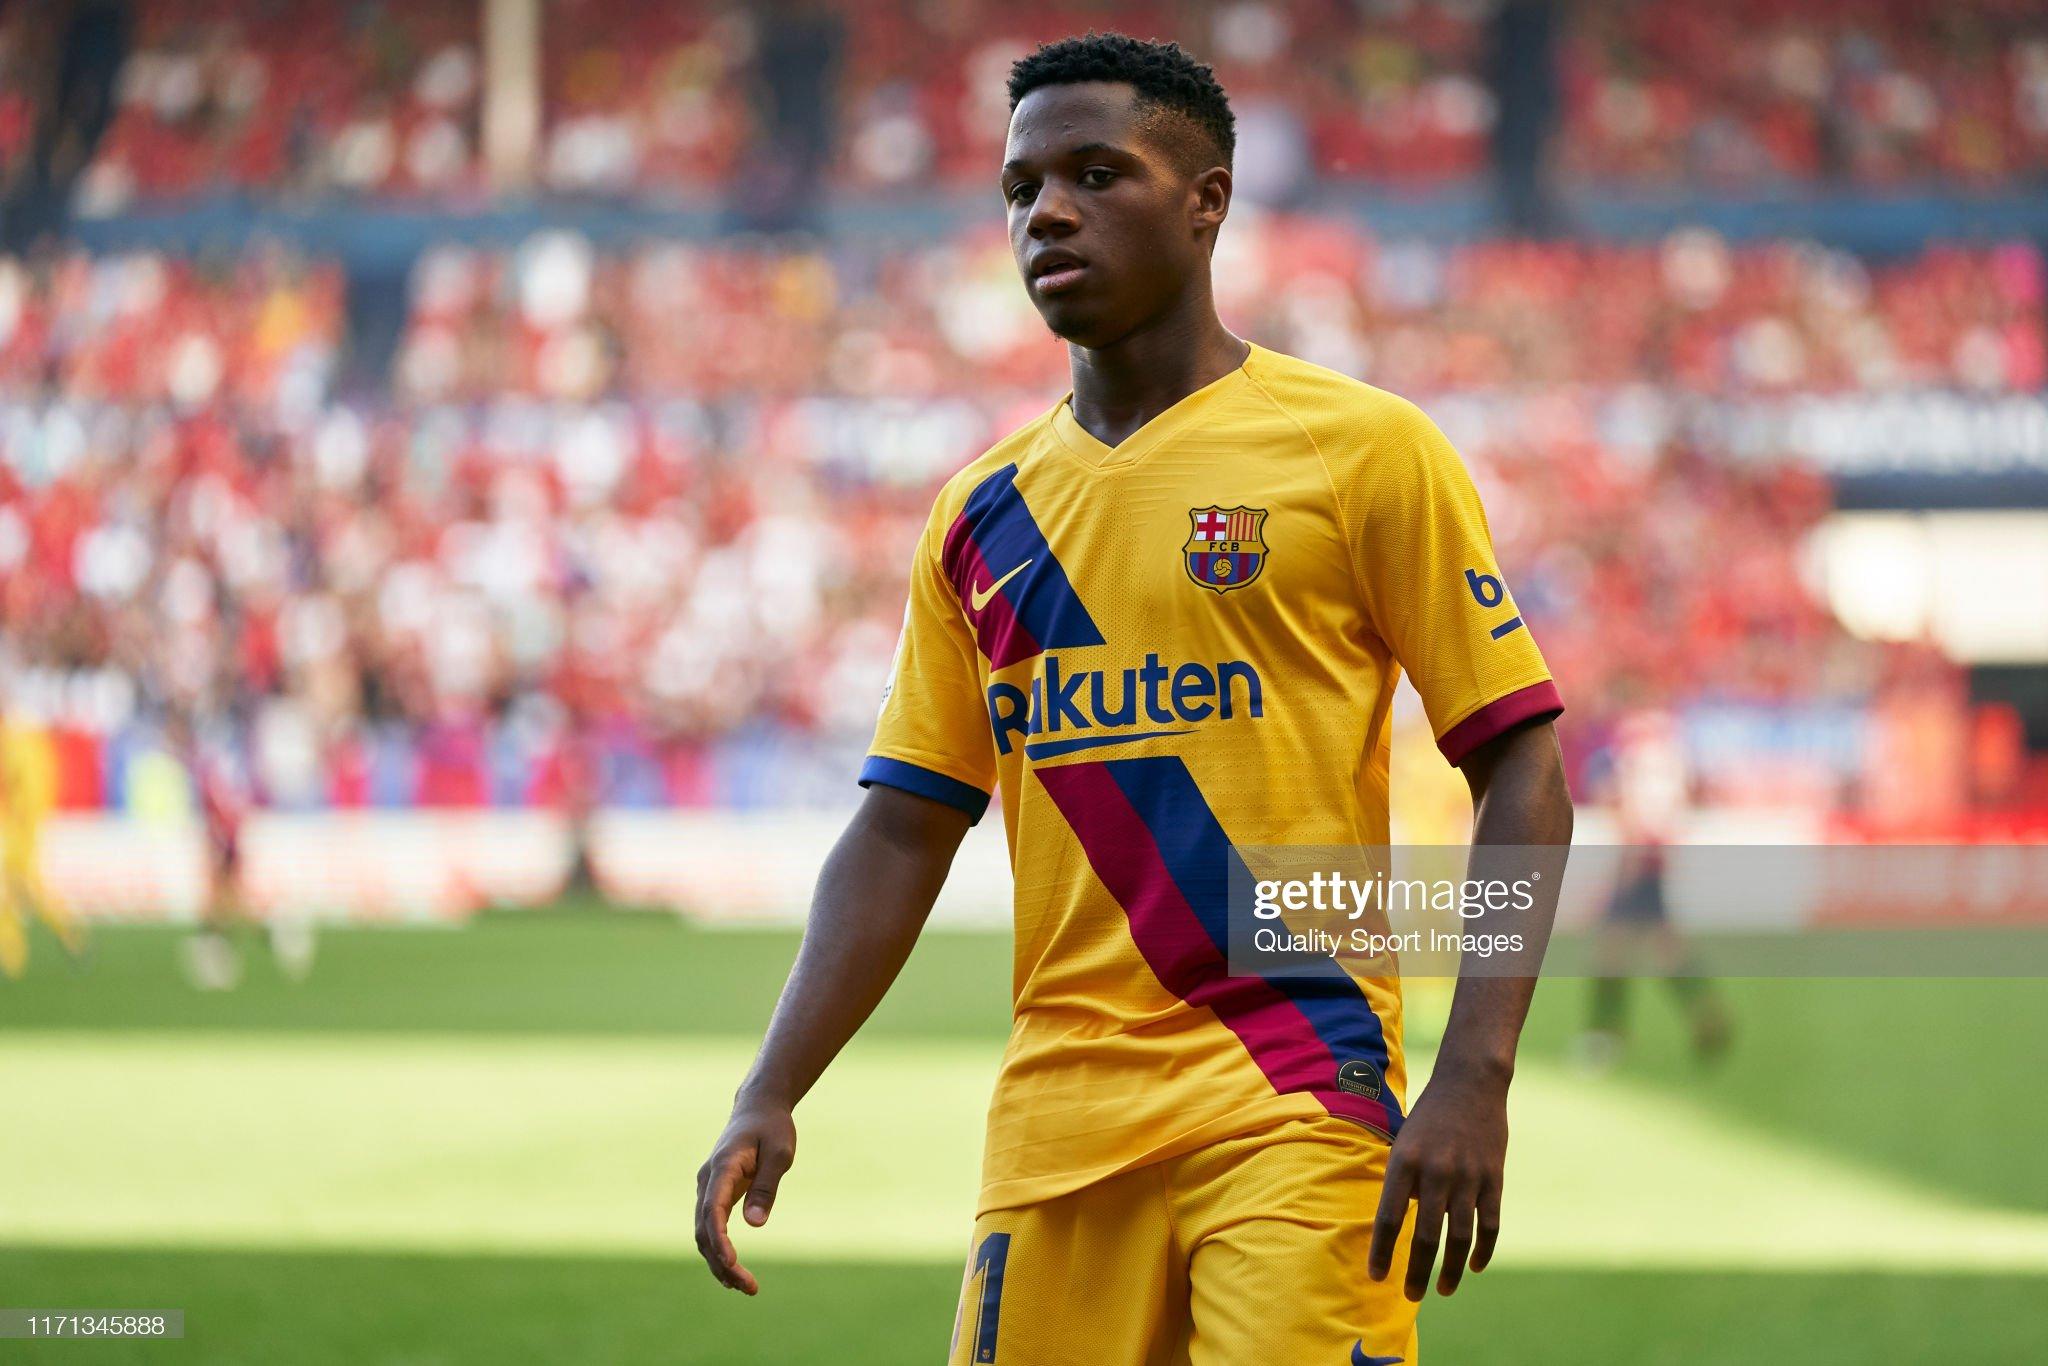 صور مباراة : أوساسونا - برشلونة 2-2 ( 31-08-2019 )  Anssumane-fati-of-fc-barcelona-looks-on-during-the-liga-match-between-picture-id1171345888?s=2048x2048